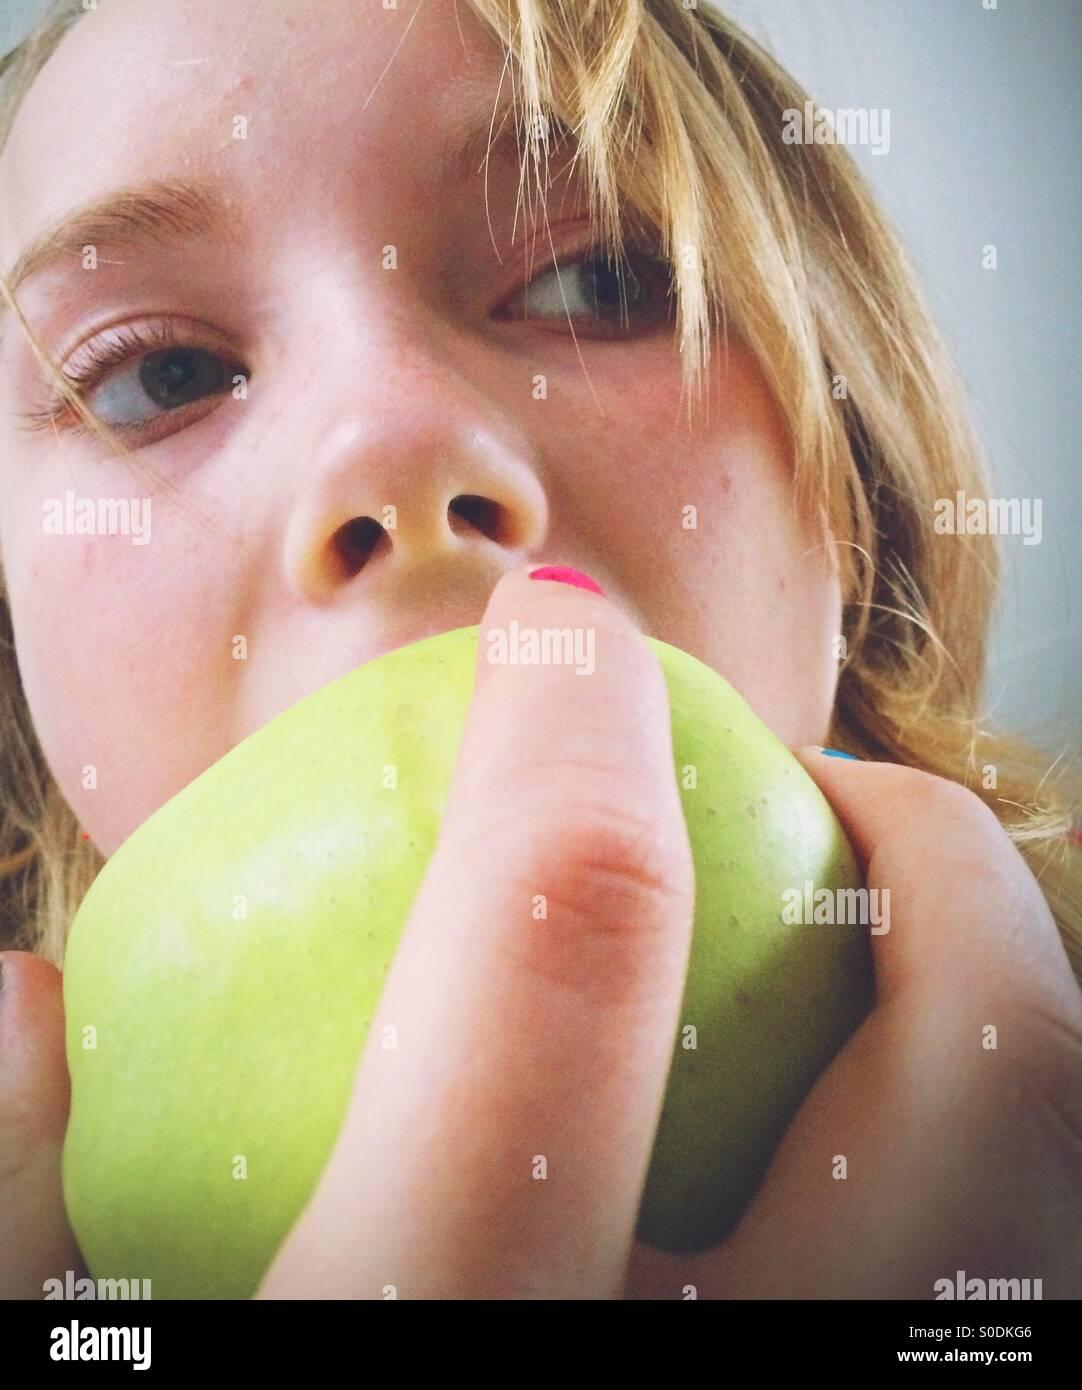 Che mangia mela Immagini Stock